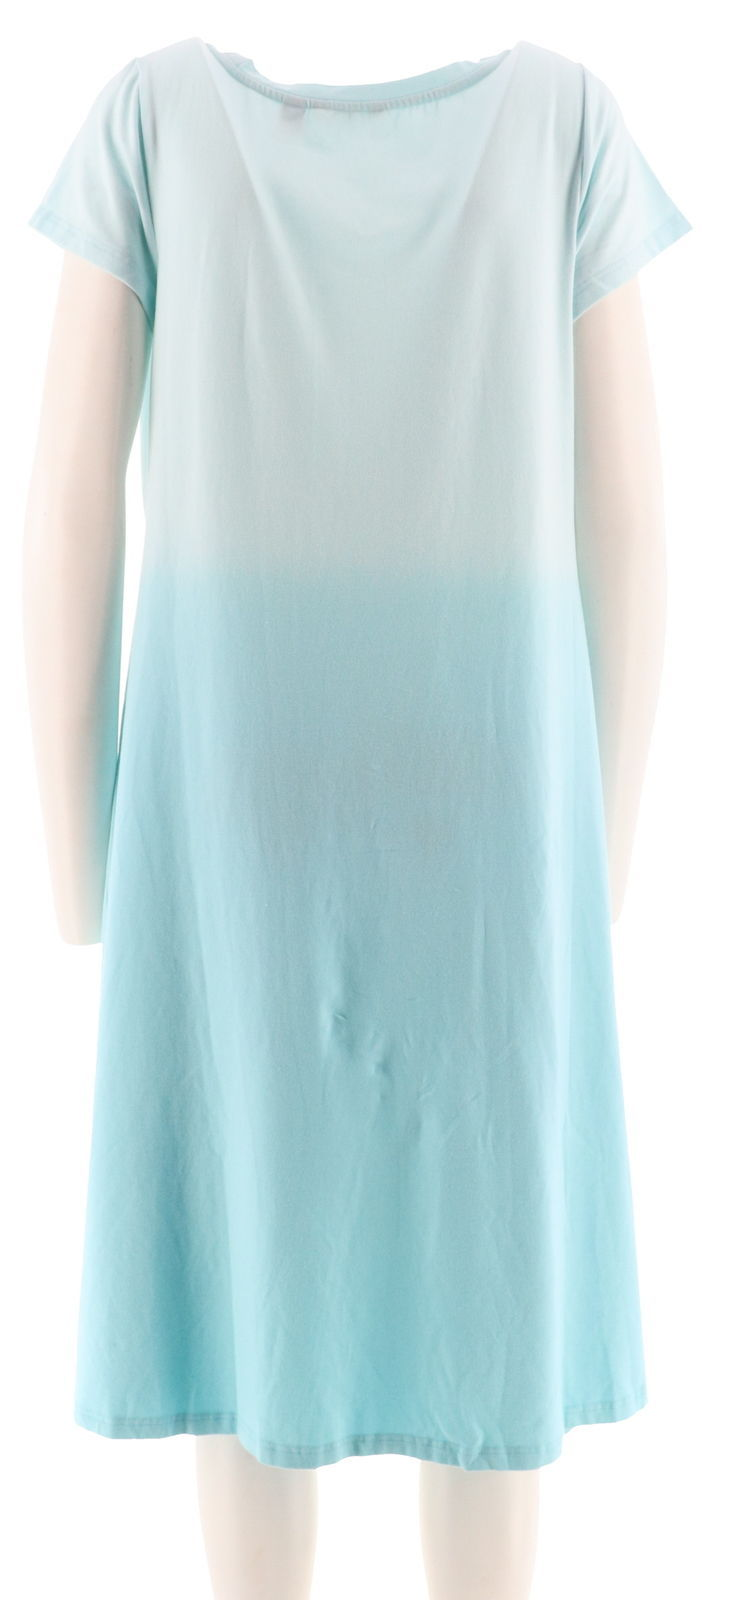 H Halston Petite Short Slv Dip Dye Knit Midi Dress Capri Blue PXS NEW A289381